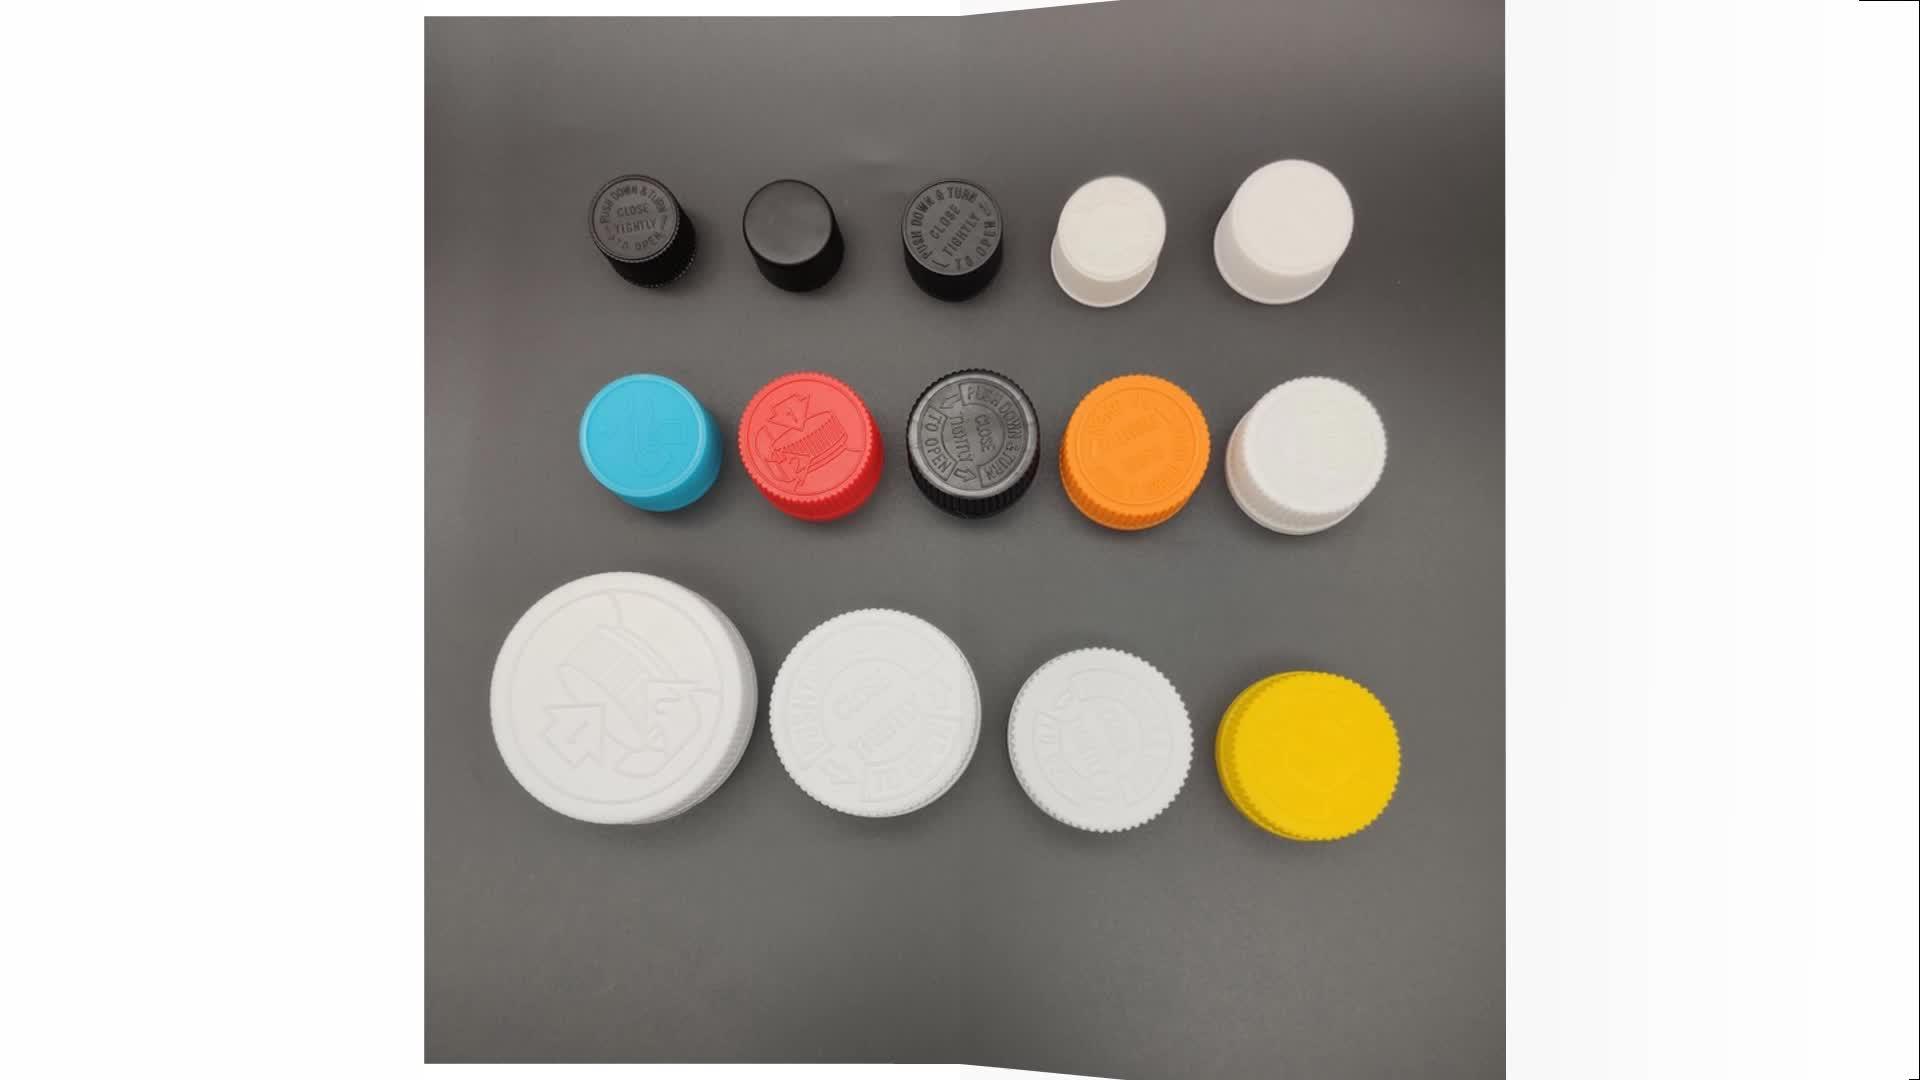 Plastic 18mm CRC Child resistant safety closures cap for medical bottle packaging